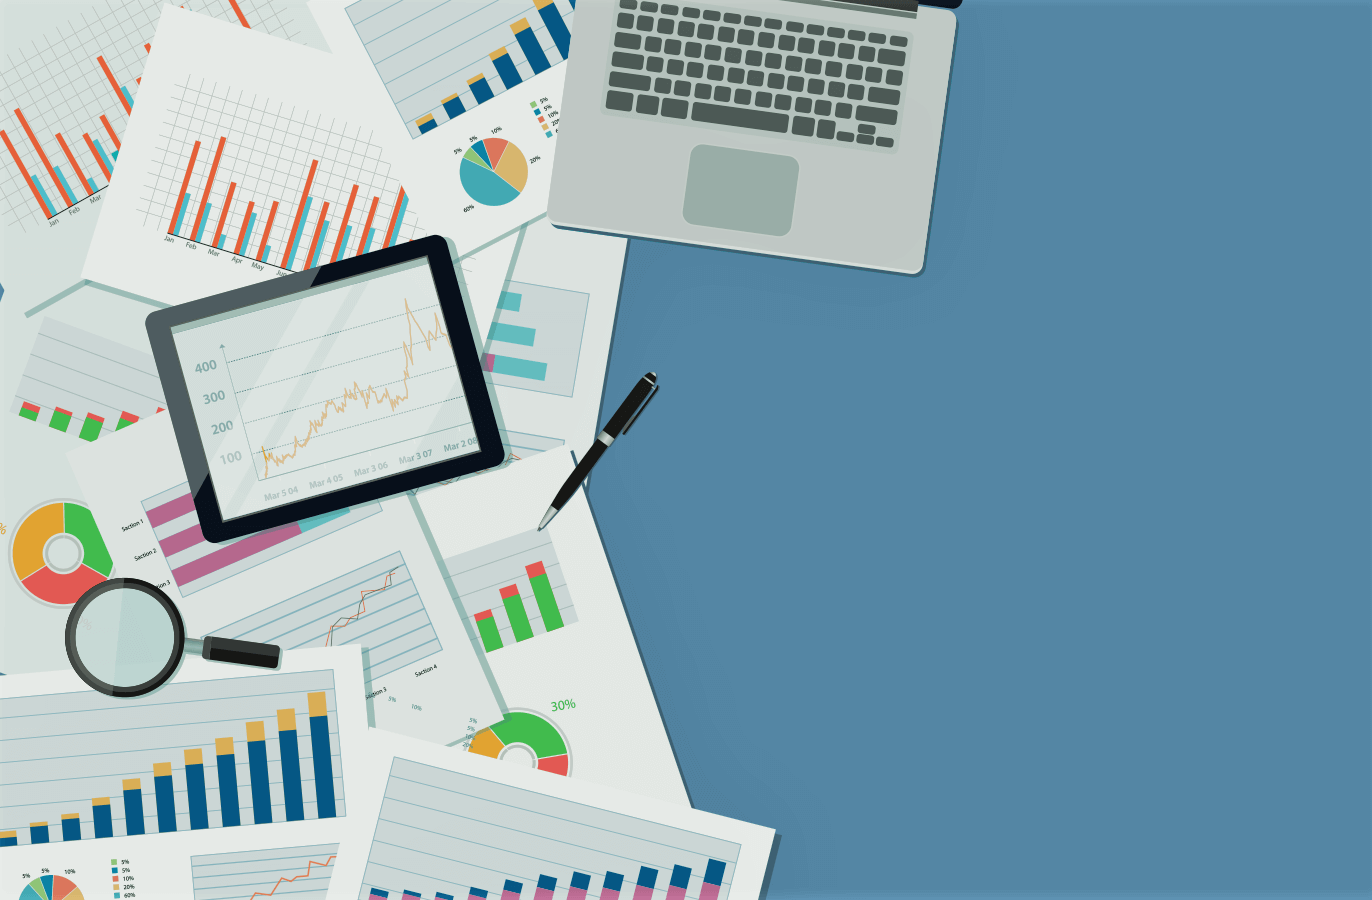 gráficos e indicadores de marketing de performance